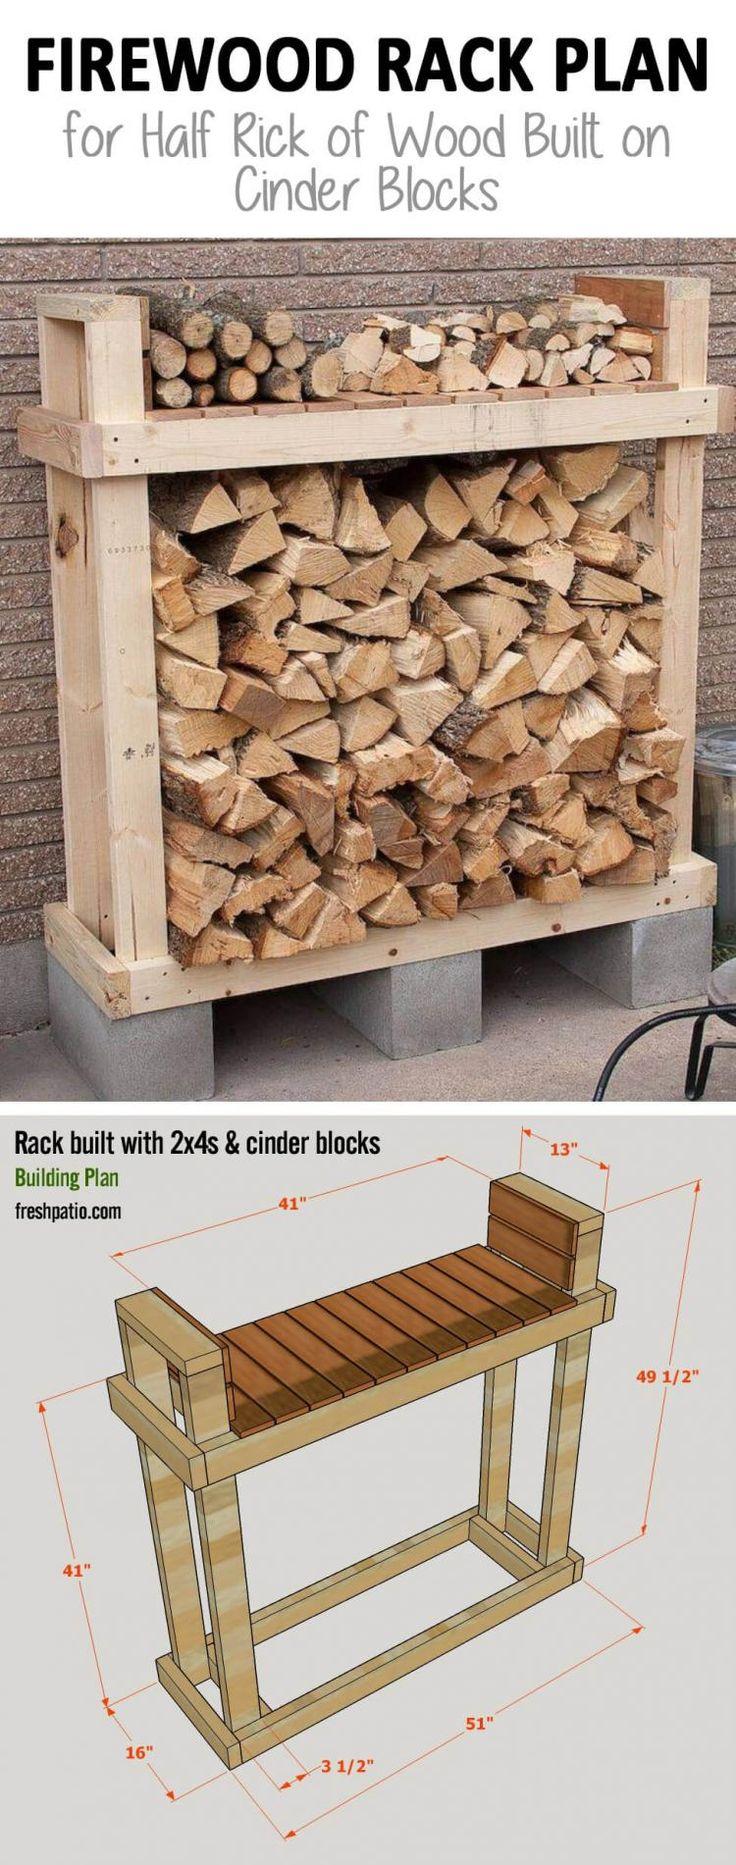 10 Creative DIY Outdoor Firewood Rack Ideas for Storage